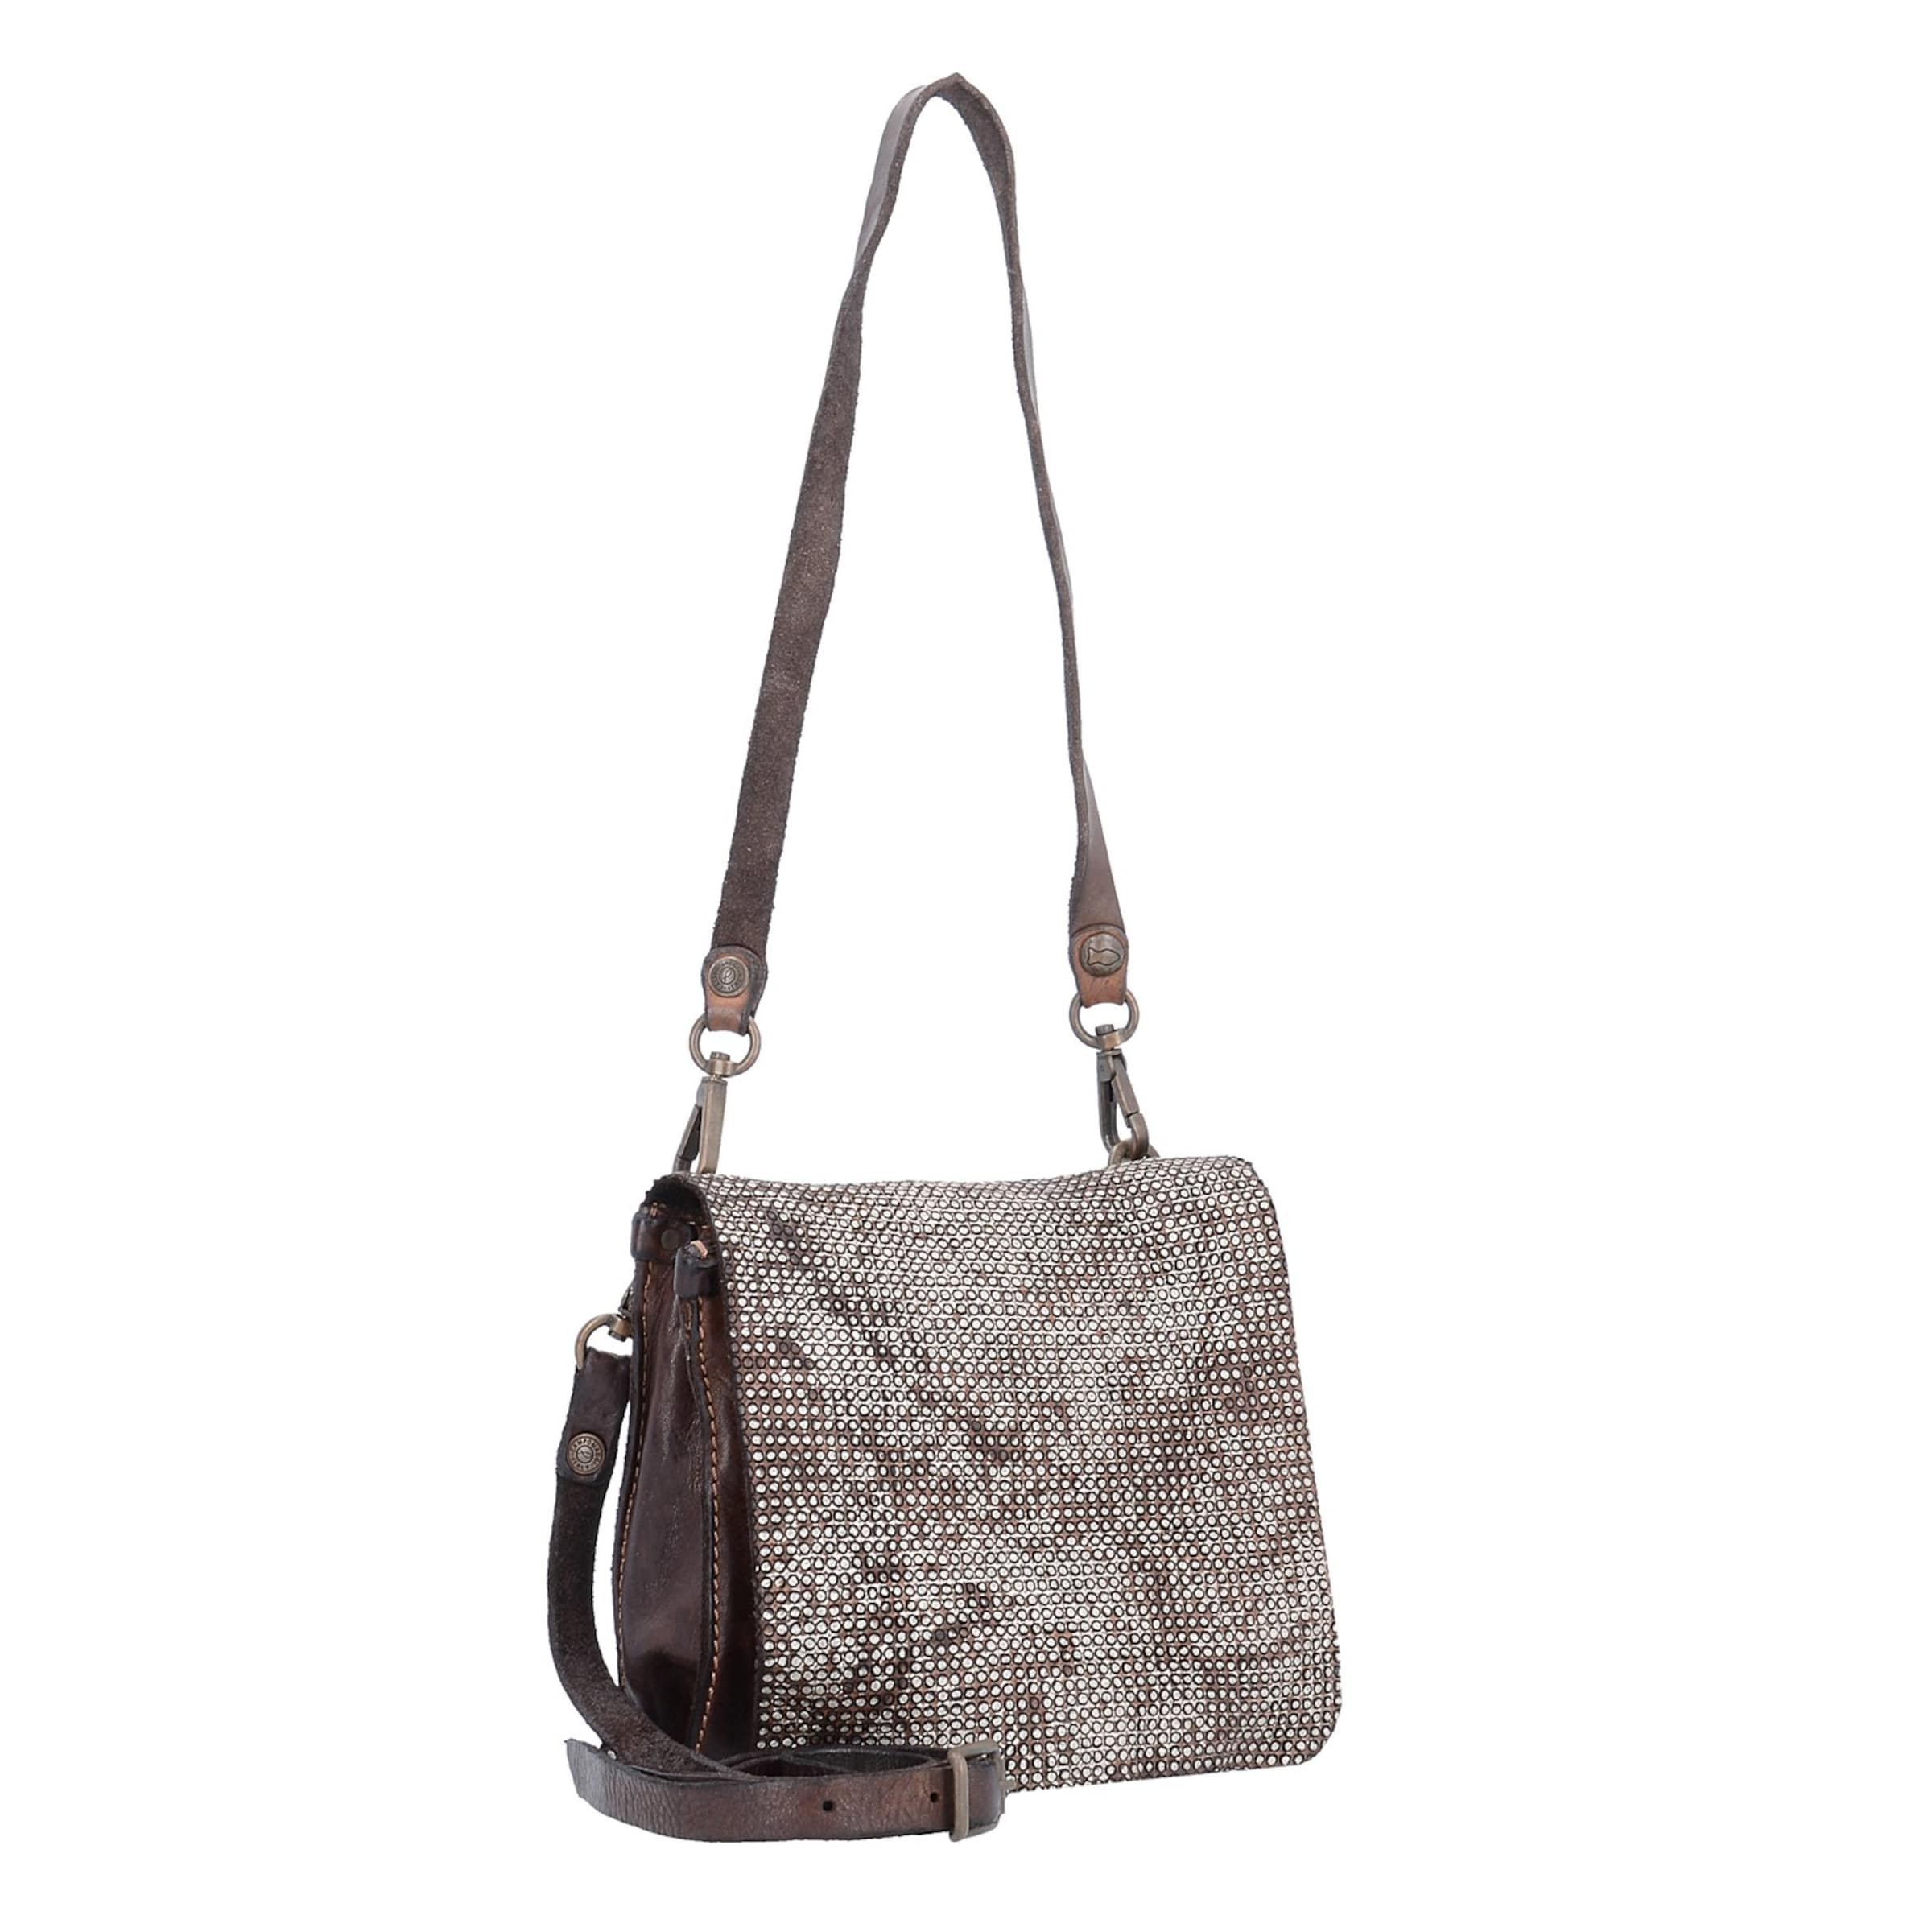 Campomaggi Bauletto Mini Bag Umhängetasche Leder 17 cm Billig Verkauf Hochwertiger v3LHDW